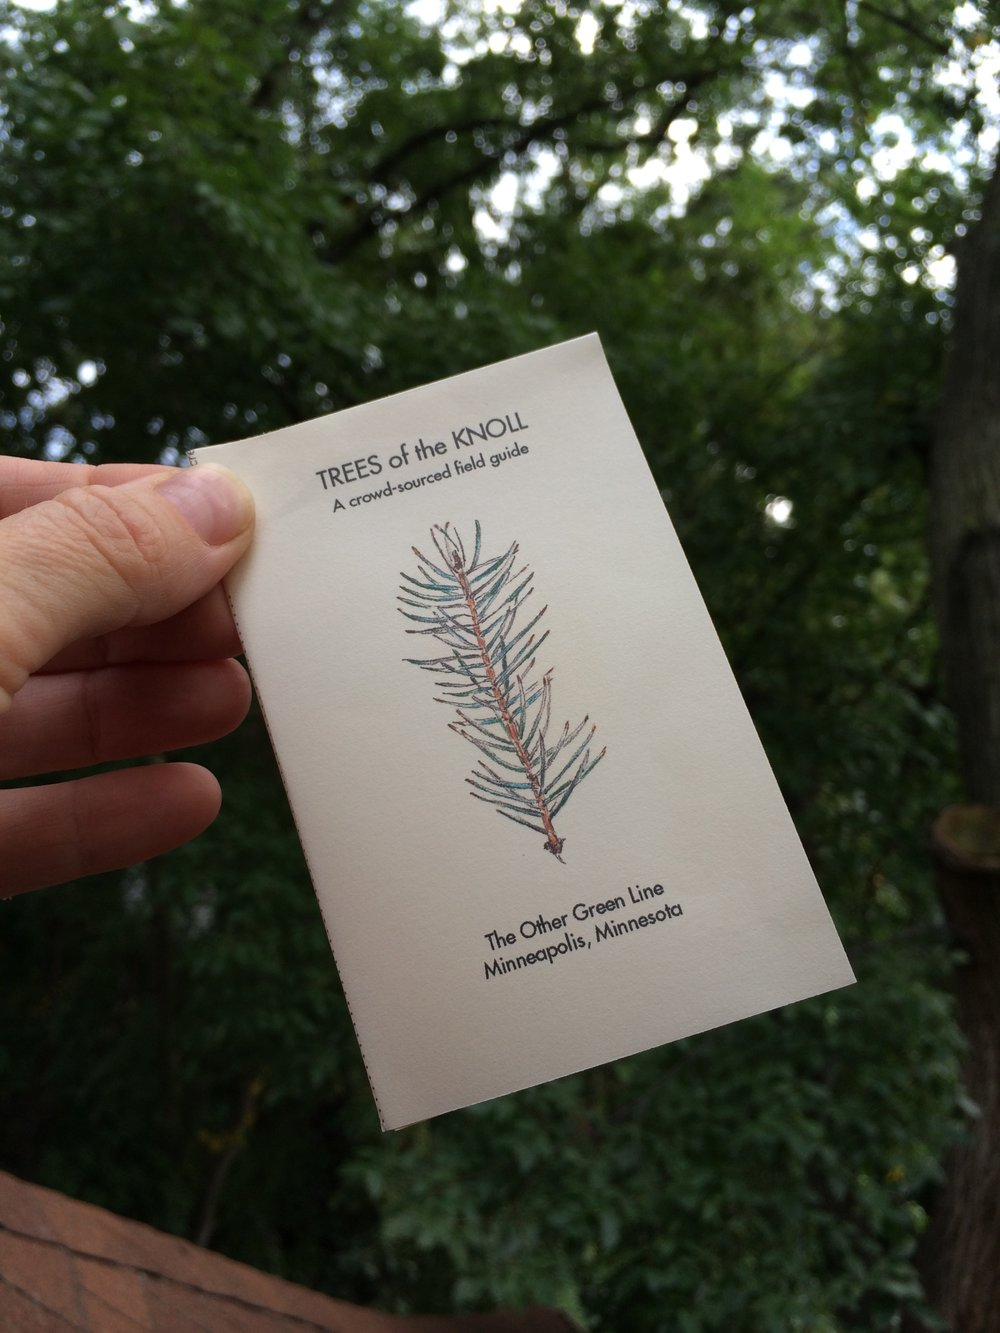 TreesOfTheKnoll.JPG